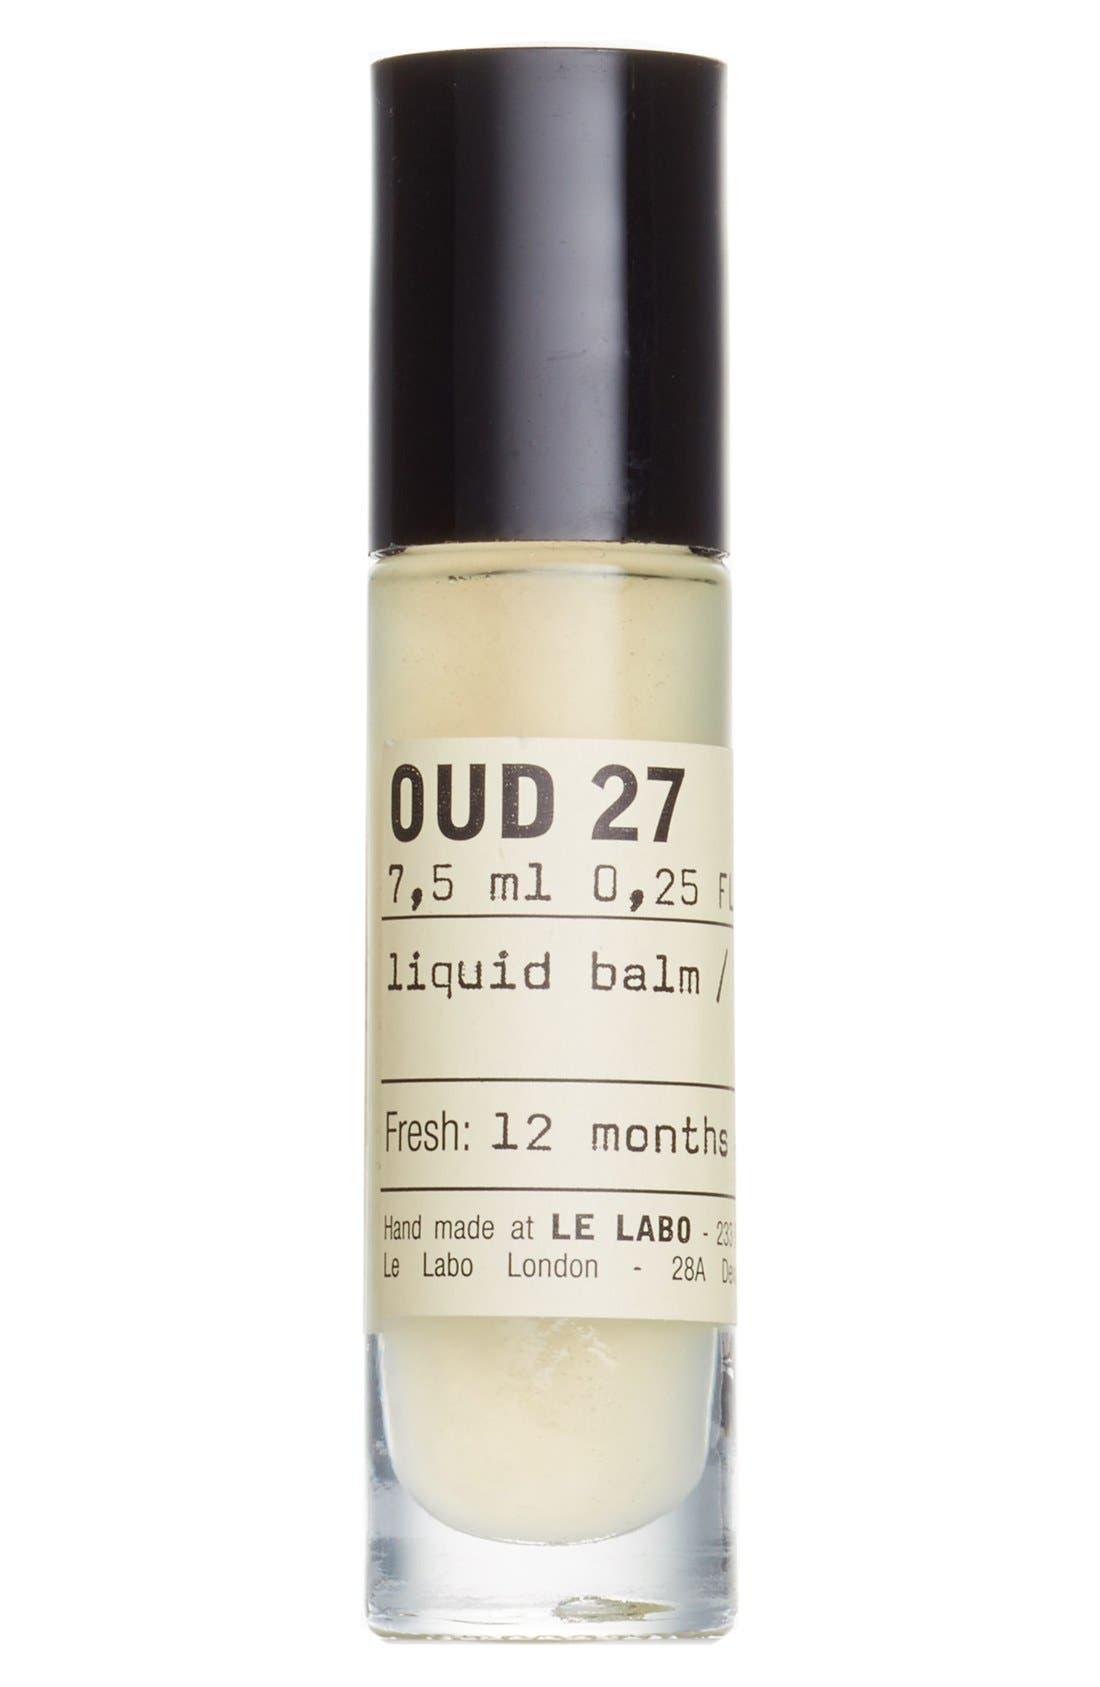 Le Labo 'Oud 27' Liquid Balm